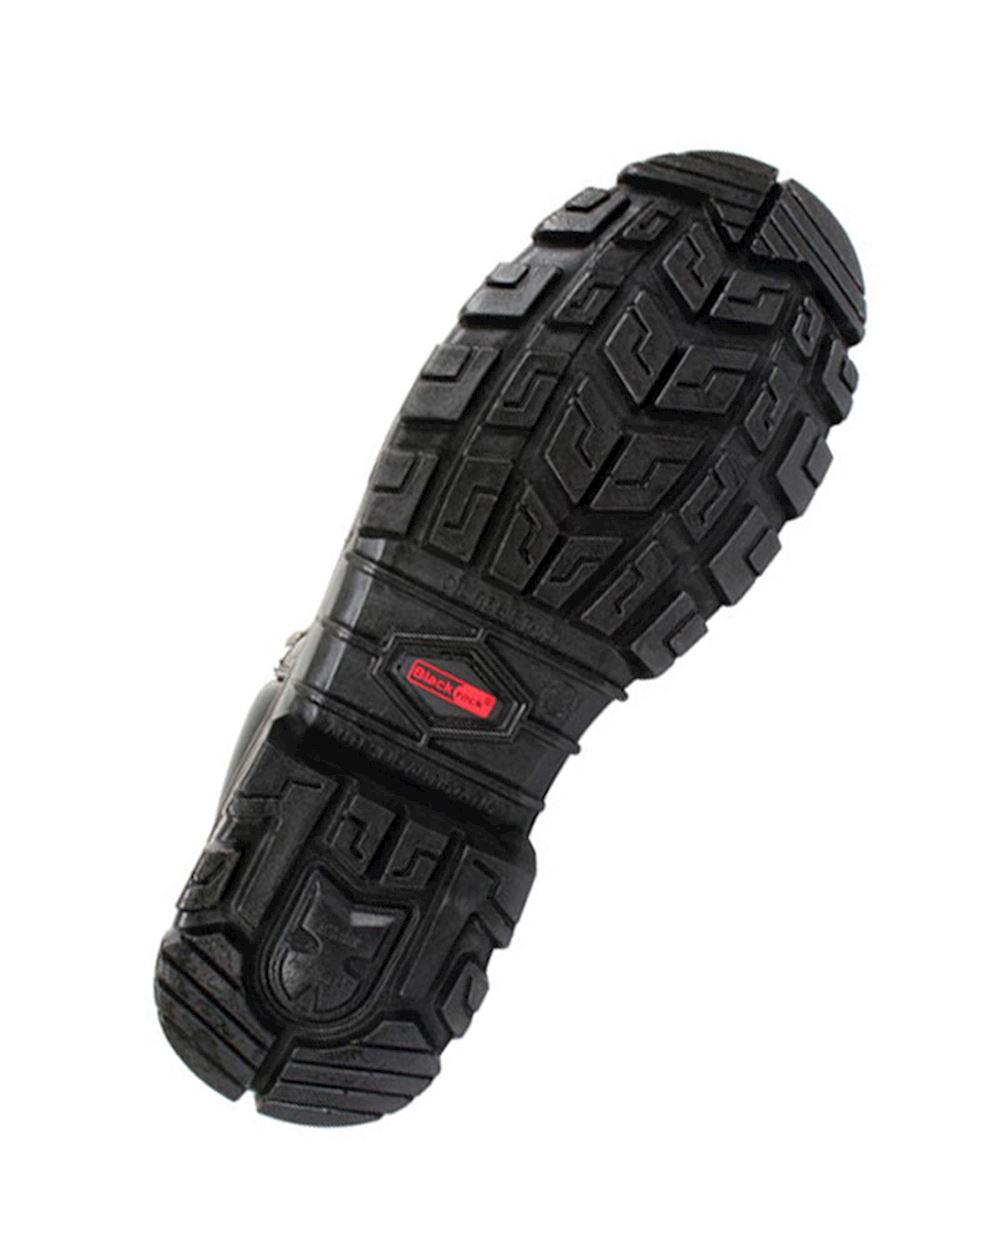 7cbde9351bc Black Rigger Boots Fur Lined - Steel Toe & Midsole By Blackrock